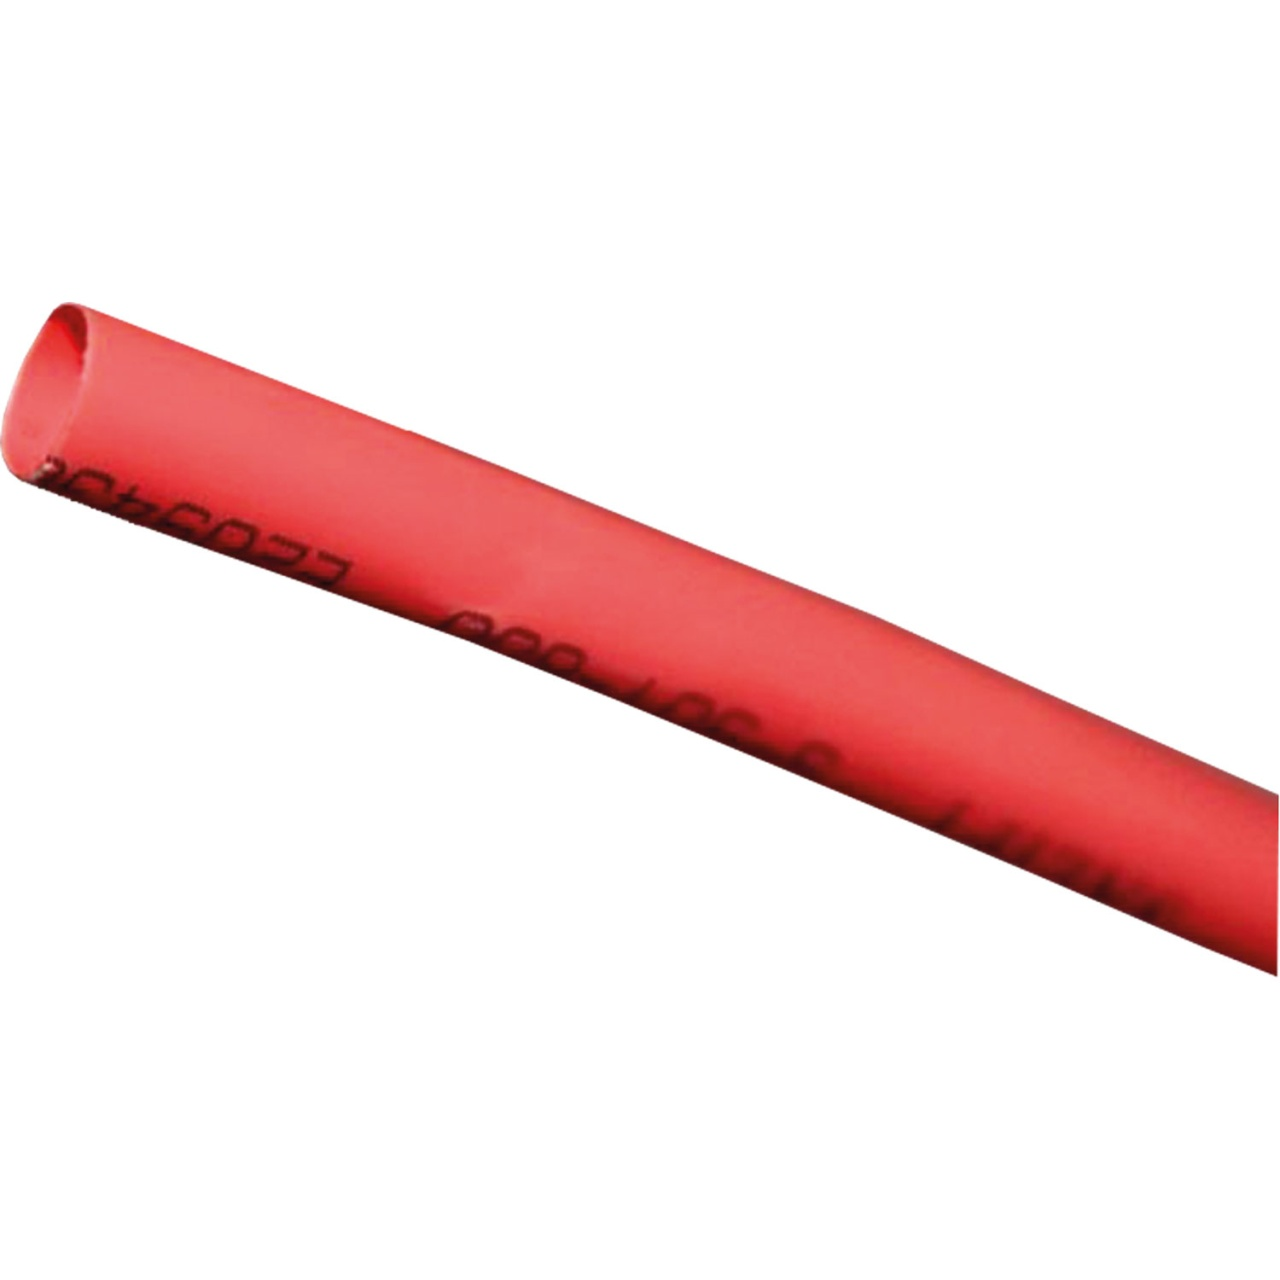 Schrumpfschlauch 10,0 mm ROT